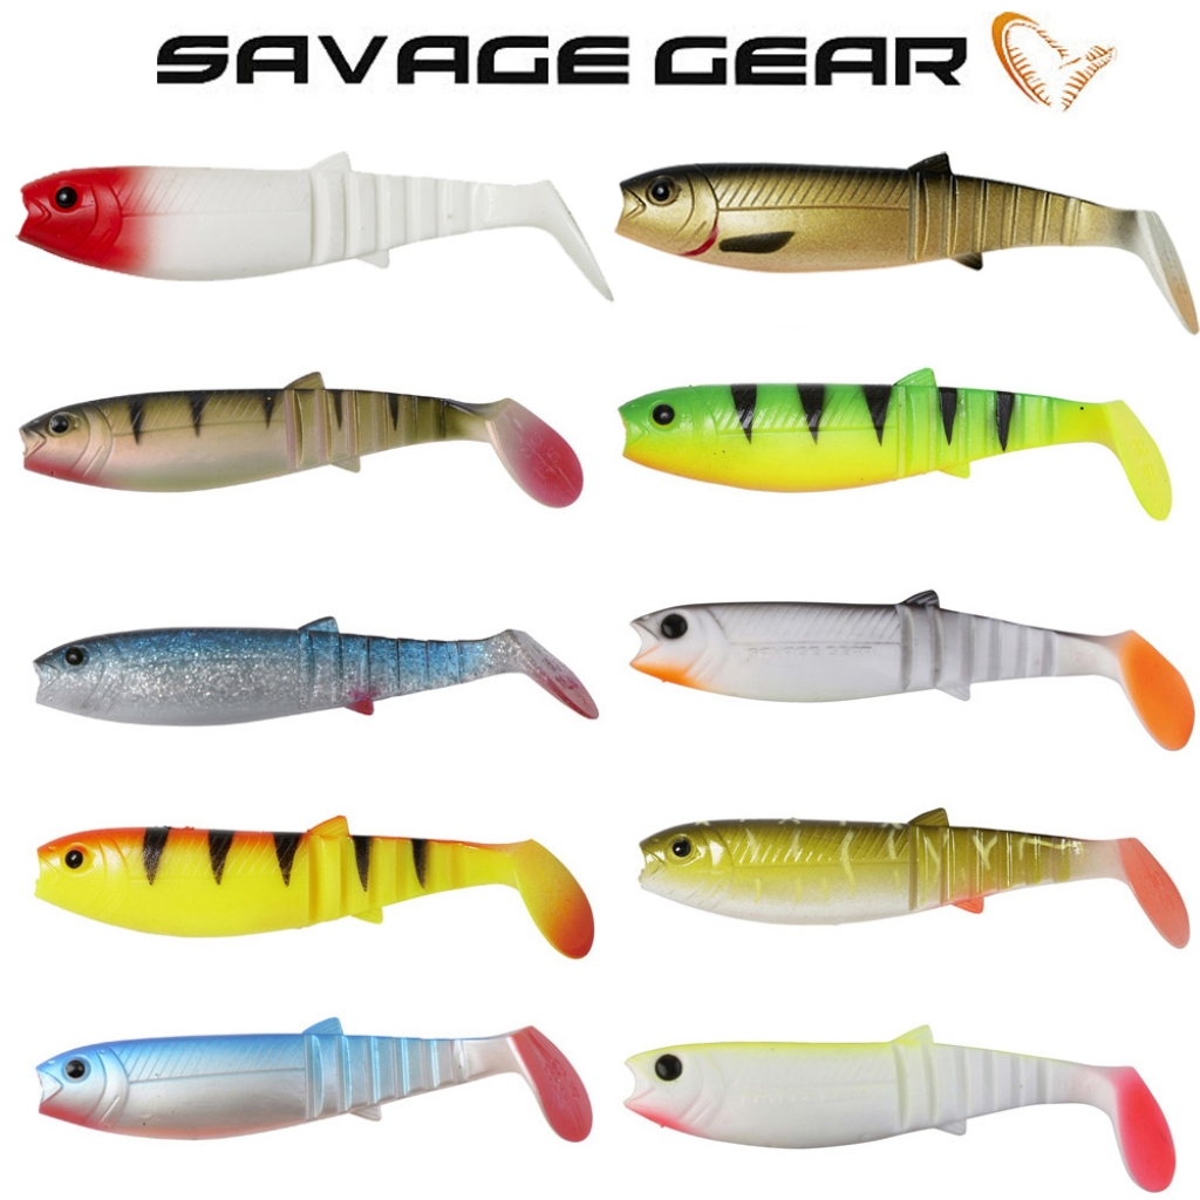 Savage Gear Cannibal Shad Gummifisch 6 Stück 8 cm 5g Farbe  Fluo Yellow